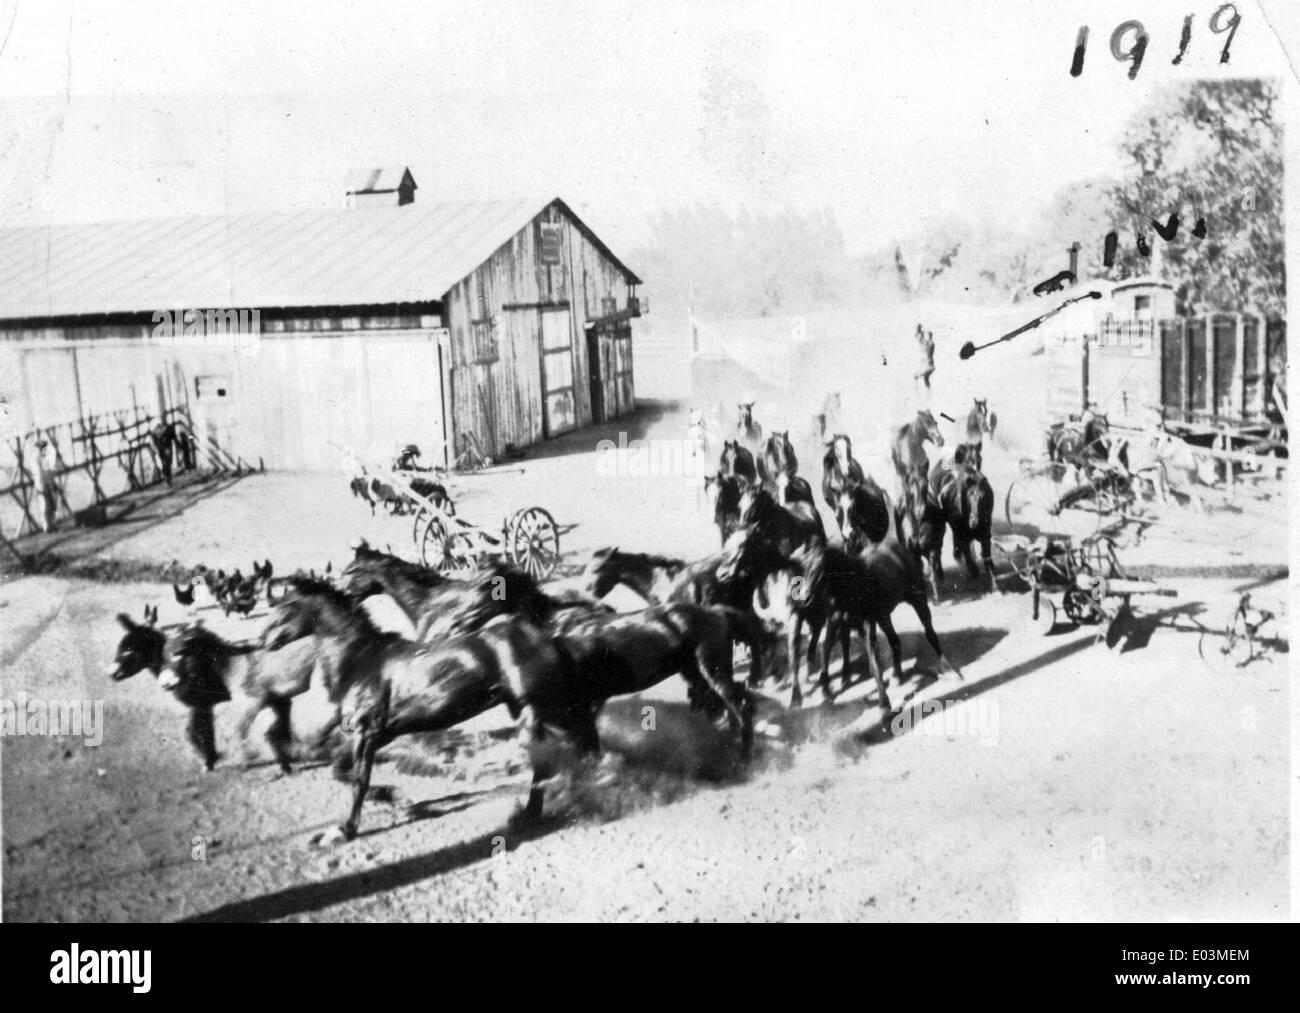 Horses running during movie stunt, 1919 - Stock Image